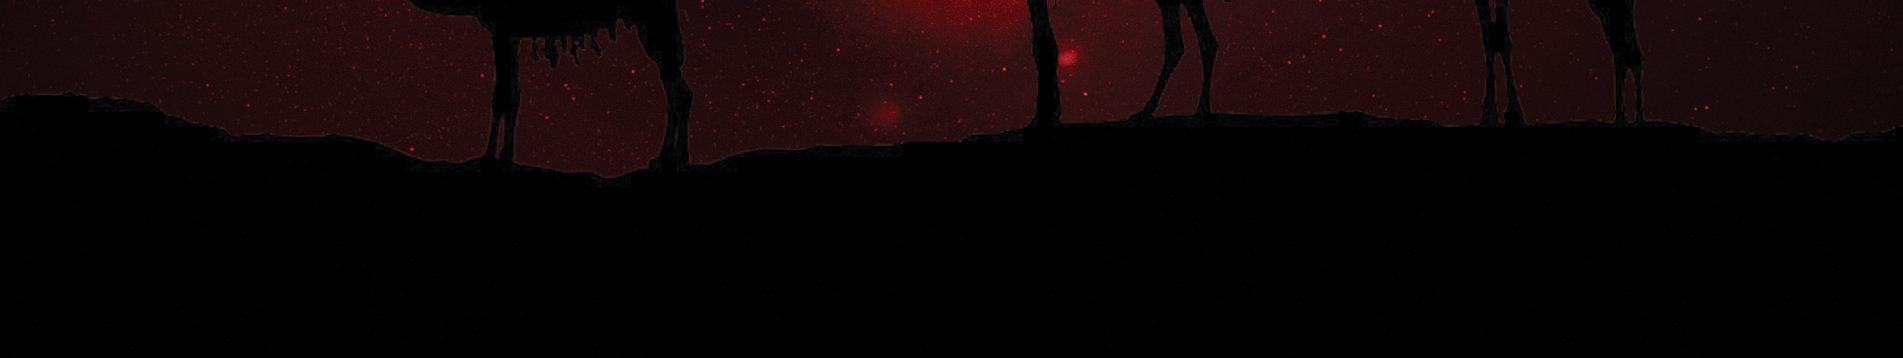 Christmas red 01.jpg